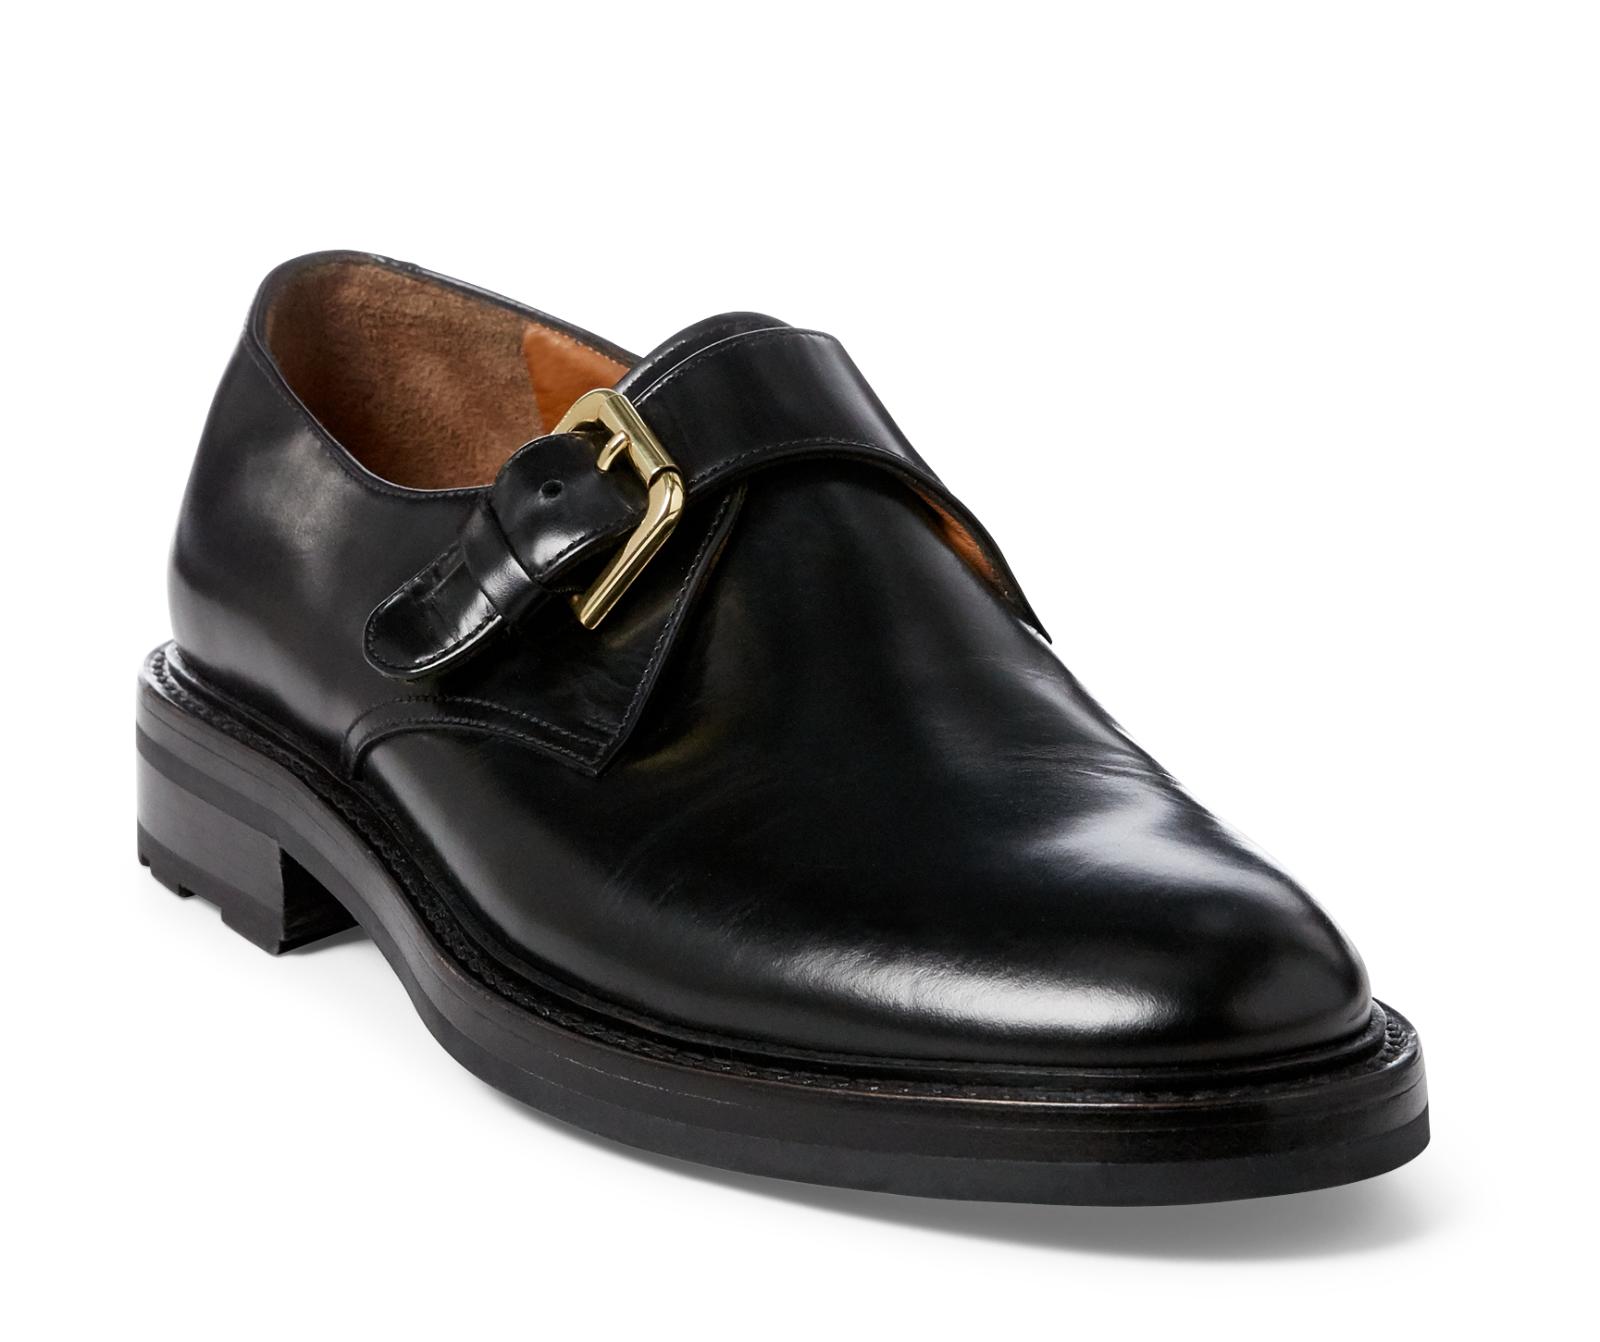 RALPH LAUREN violet Label cuir Keven Monk Strap chaussures NEW  795